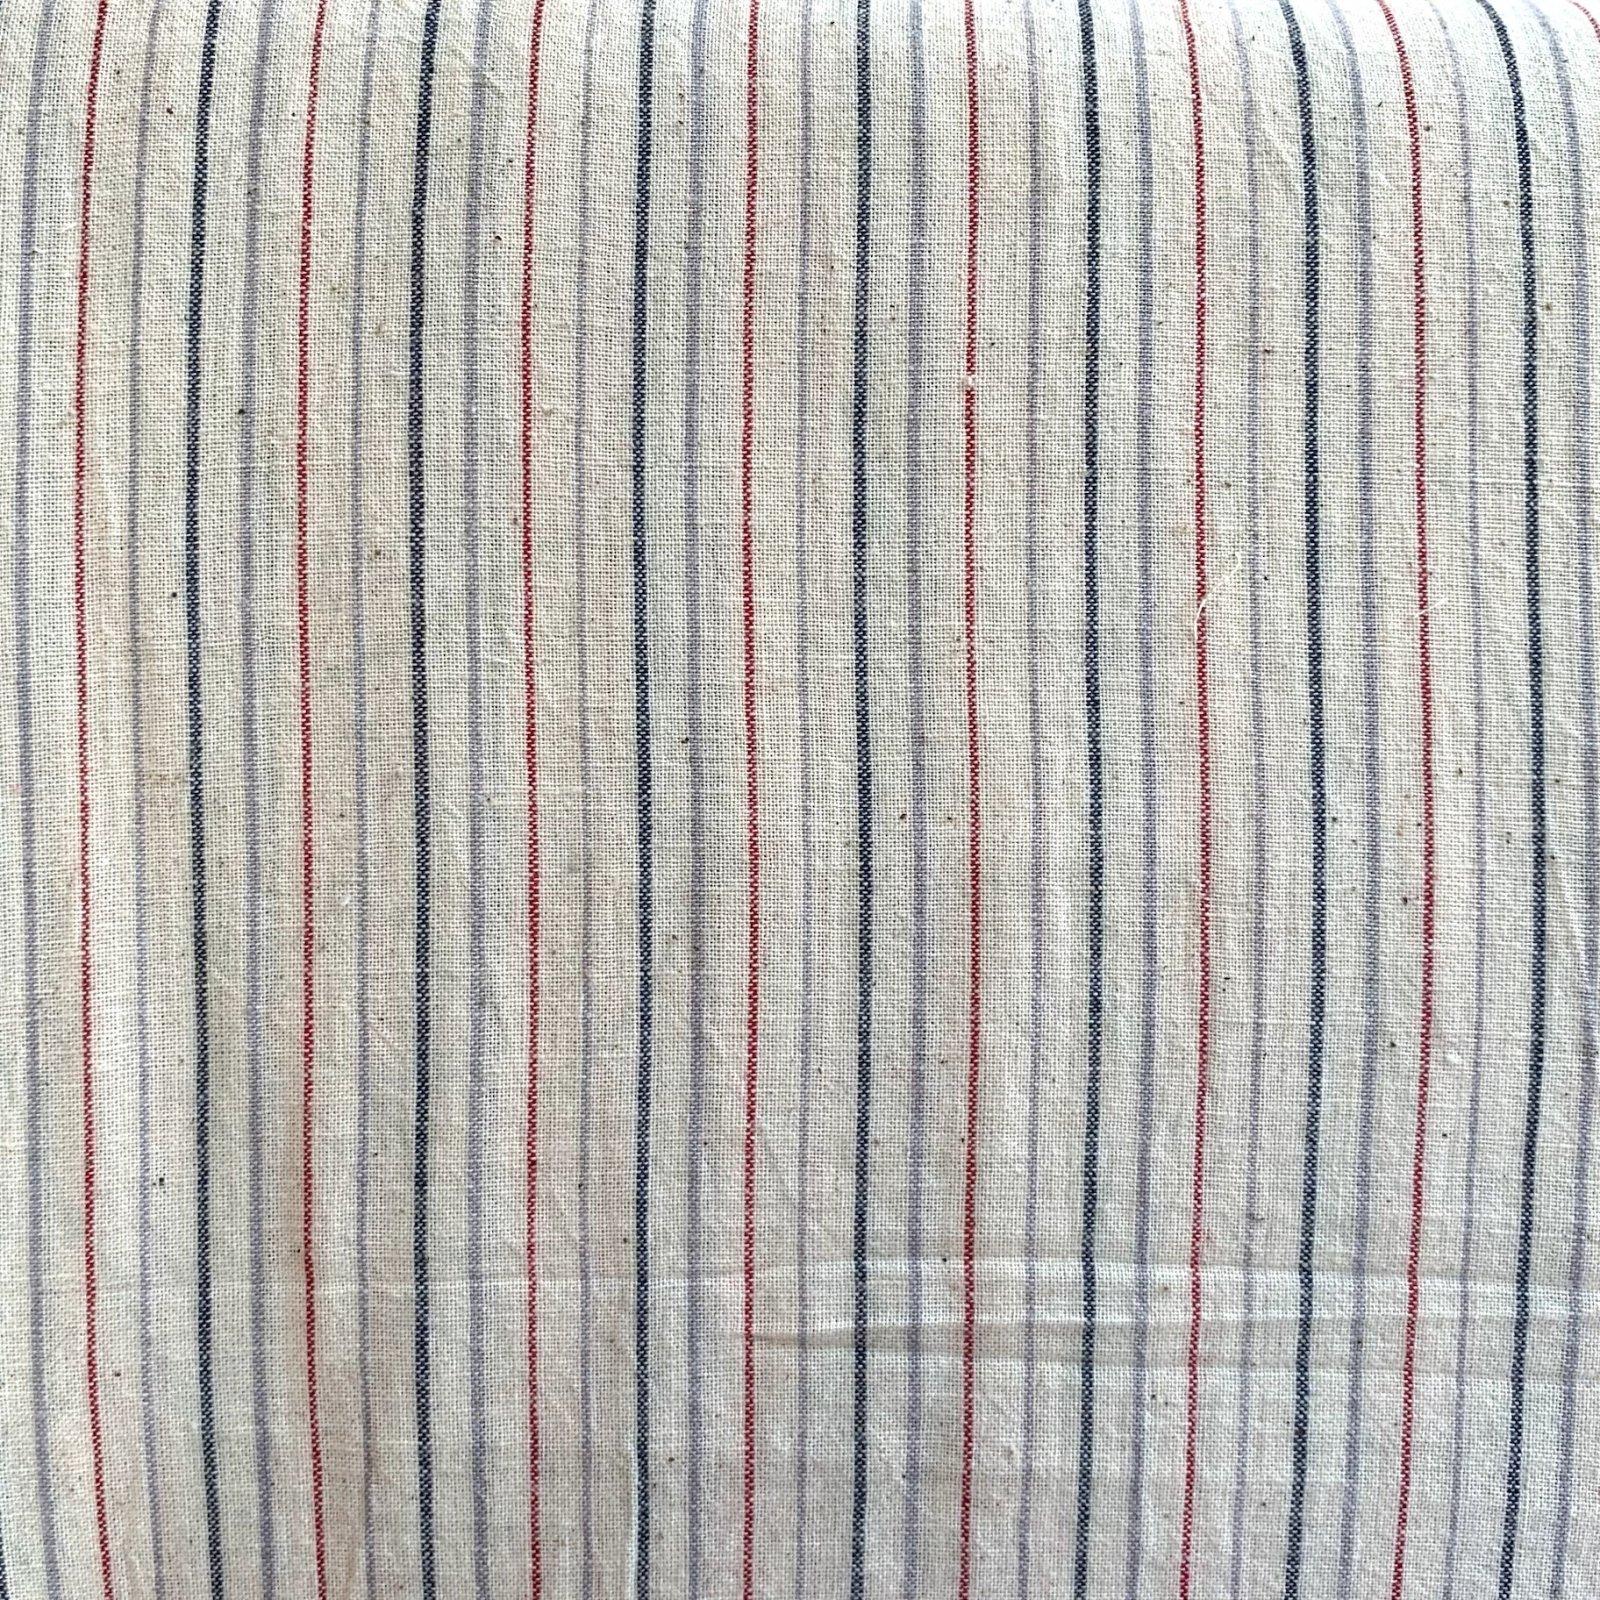 Red, Grey, Navy Stripes, Fair Trade